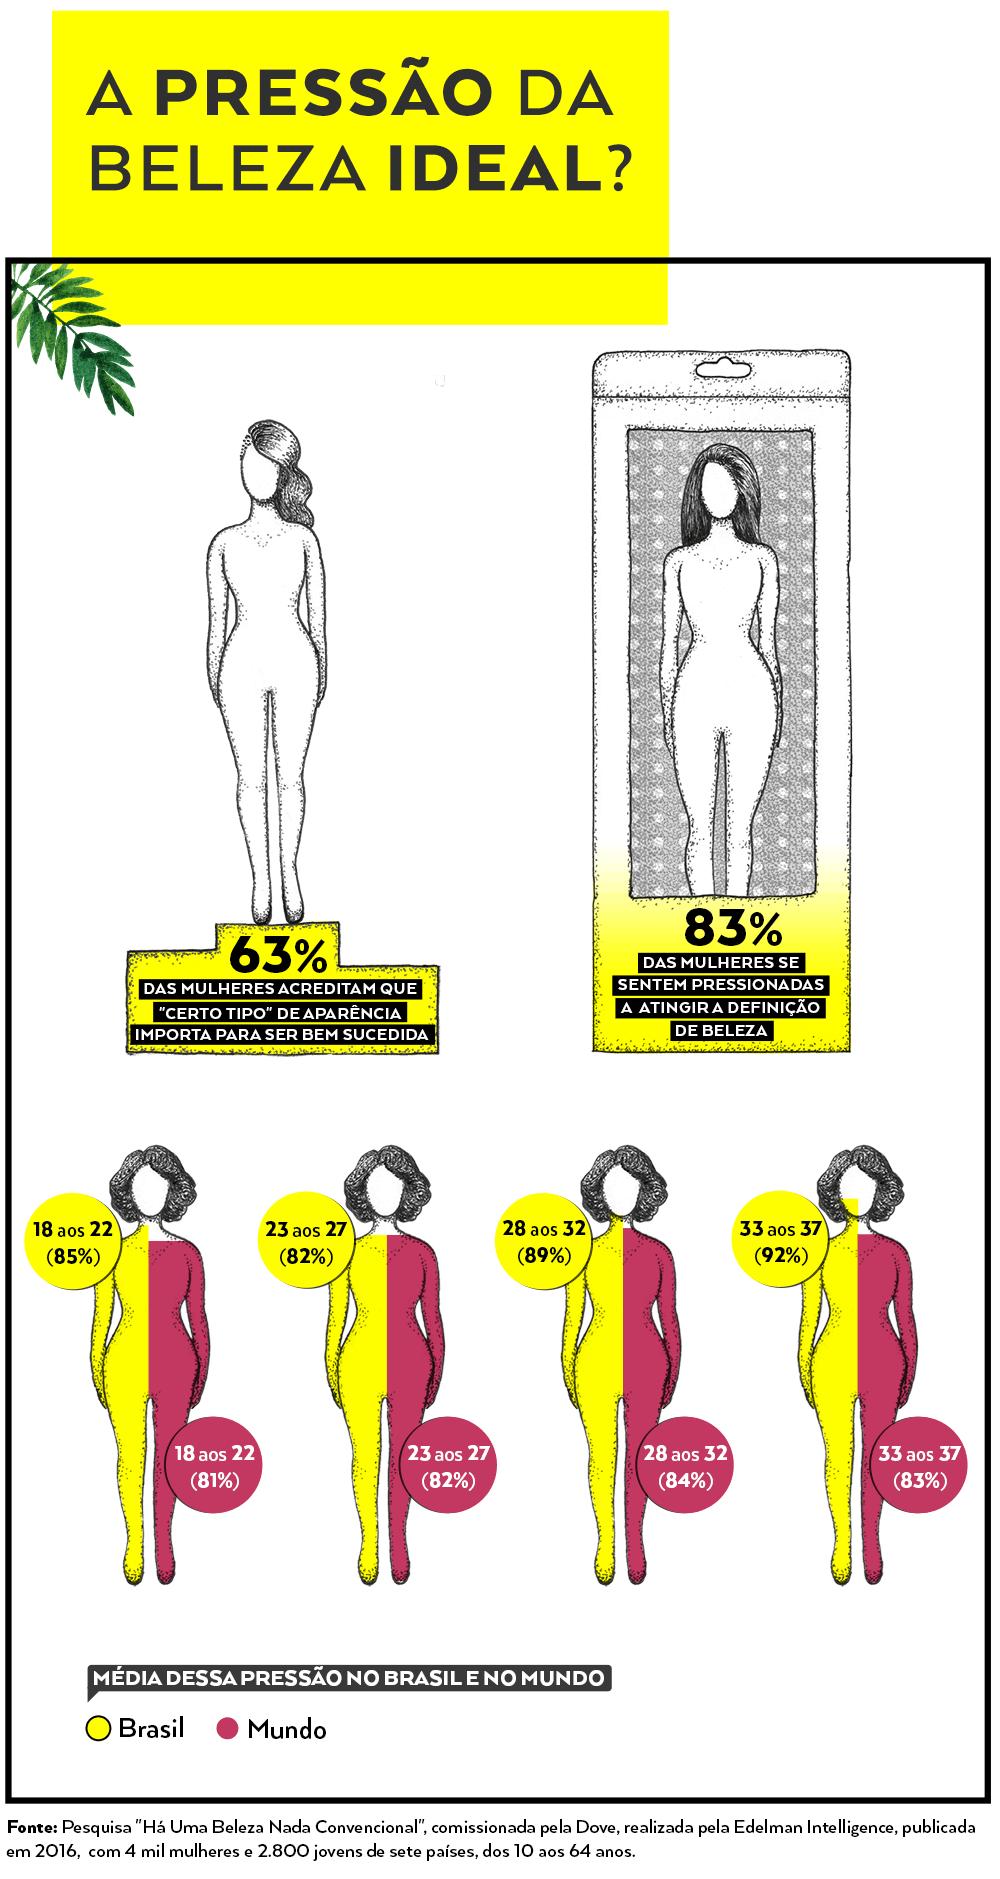 Ile Machado/Carolina Horita/Camilla Loureiro